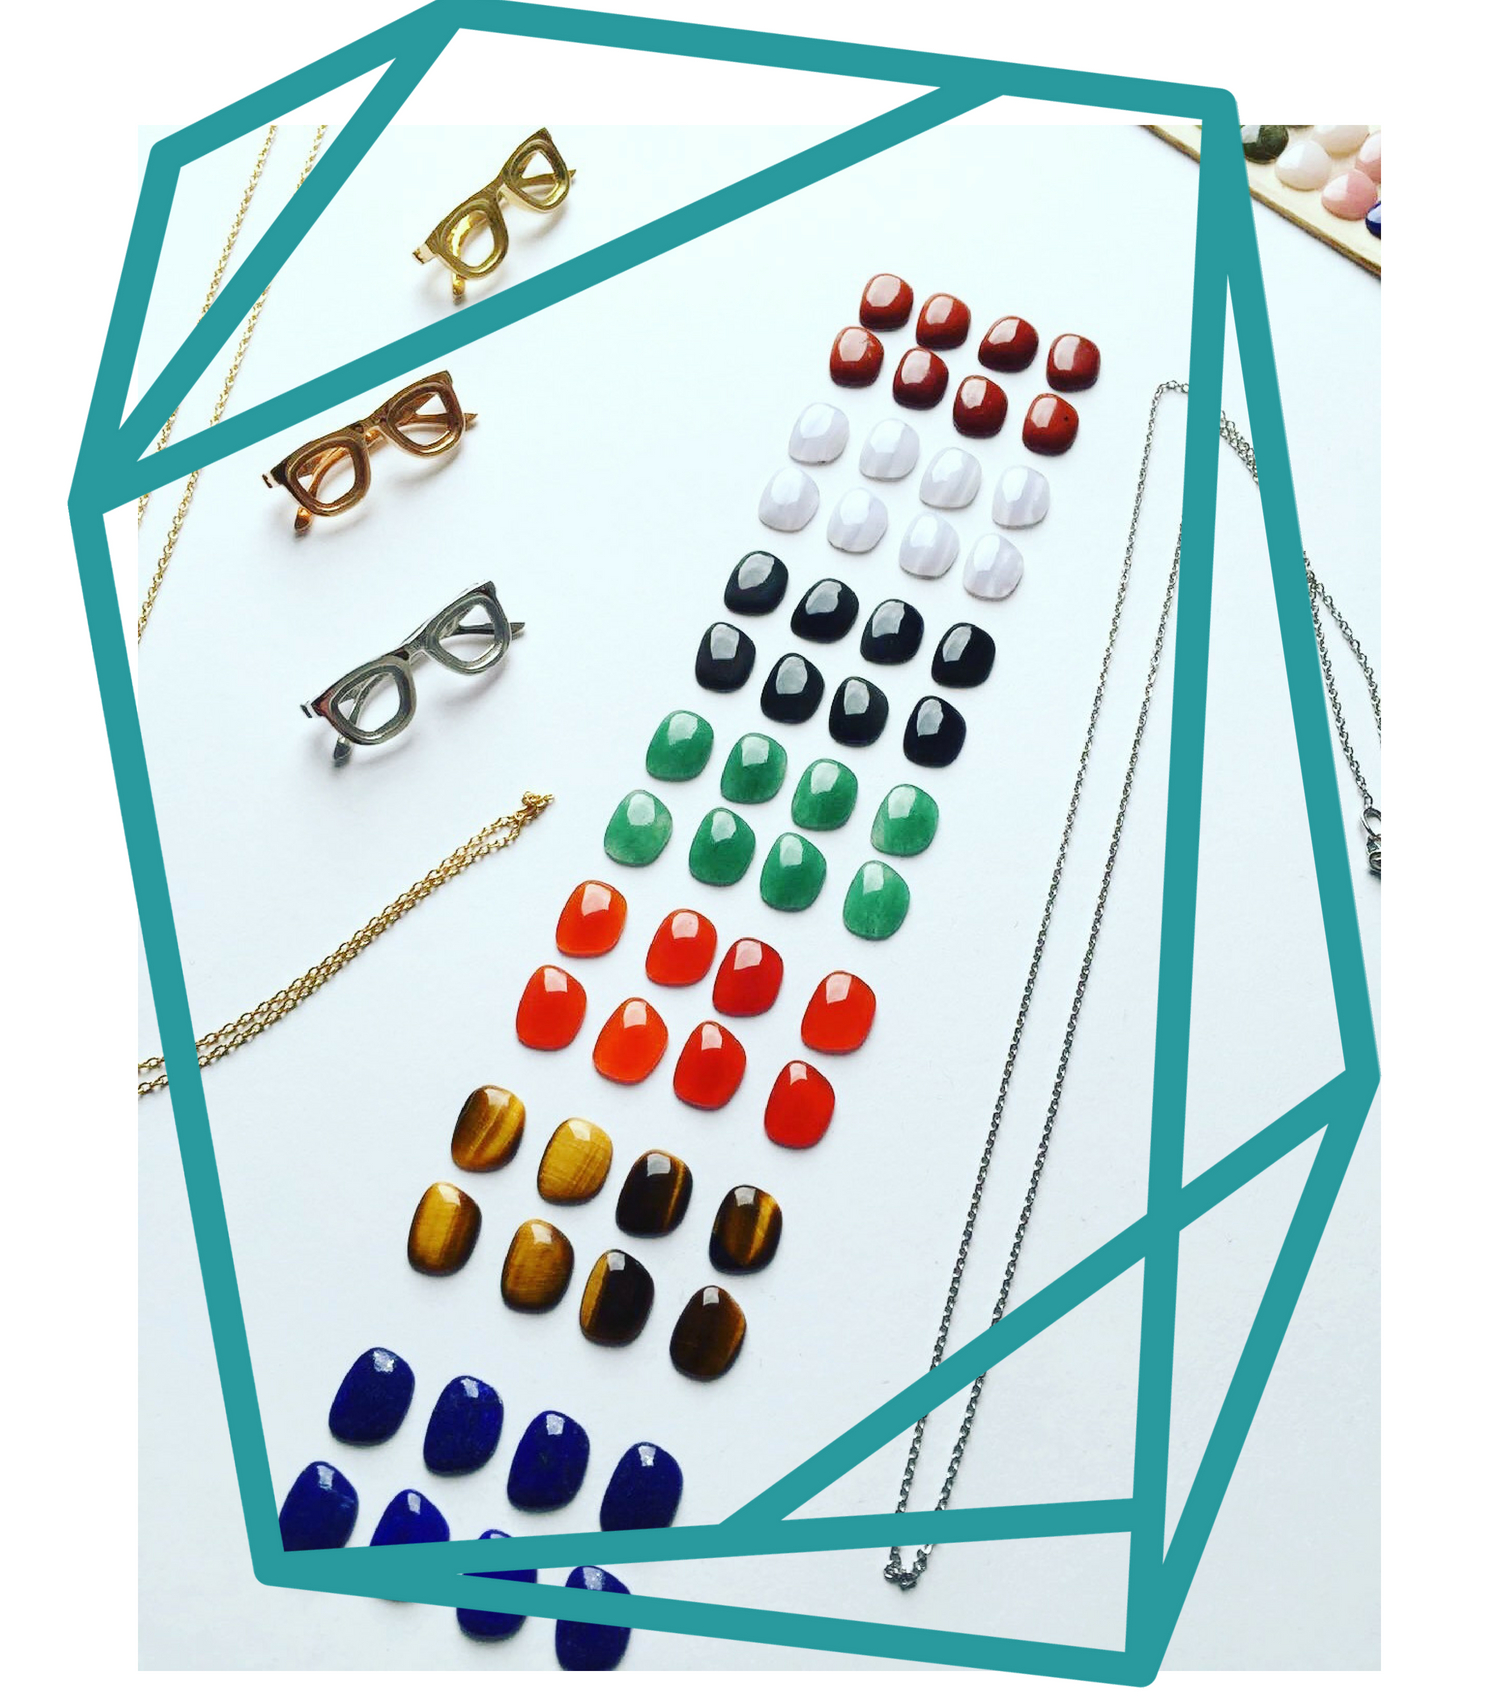 Piedras preciosas-colgantes glasses-NEHCAA